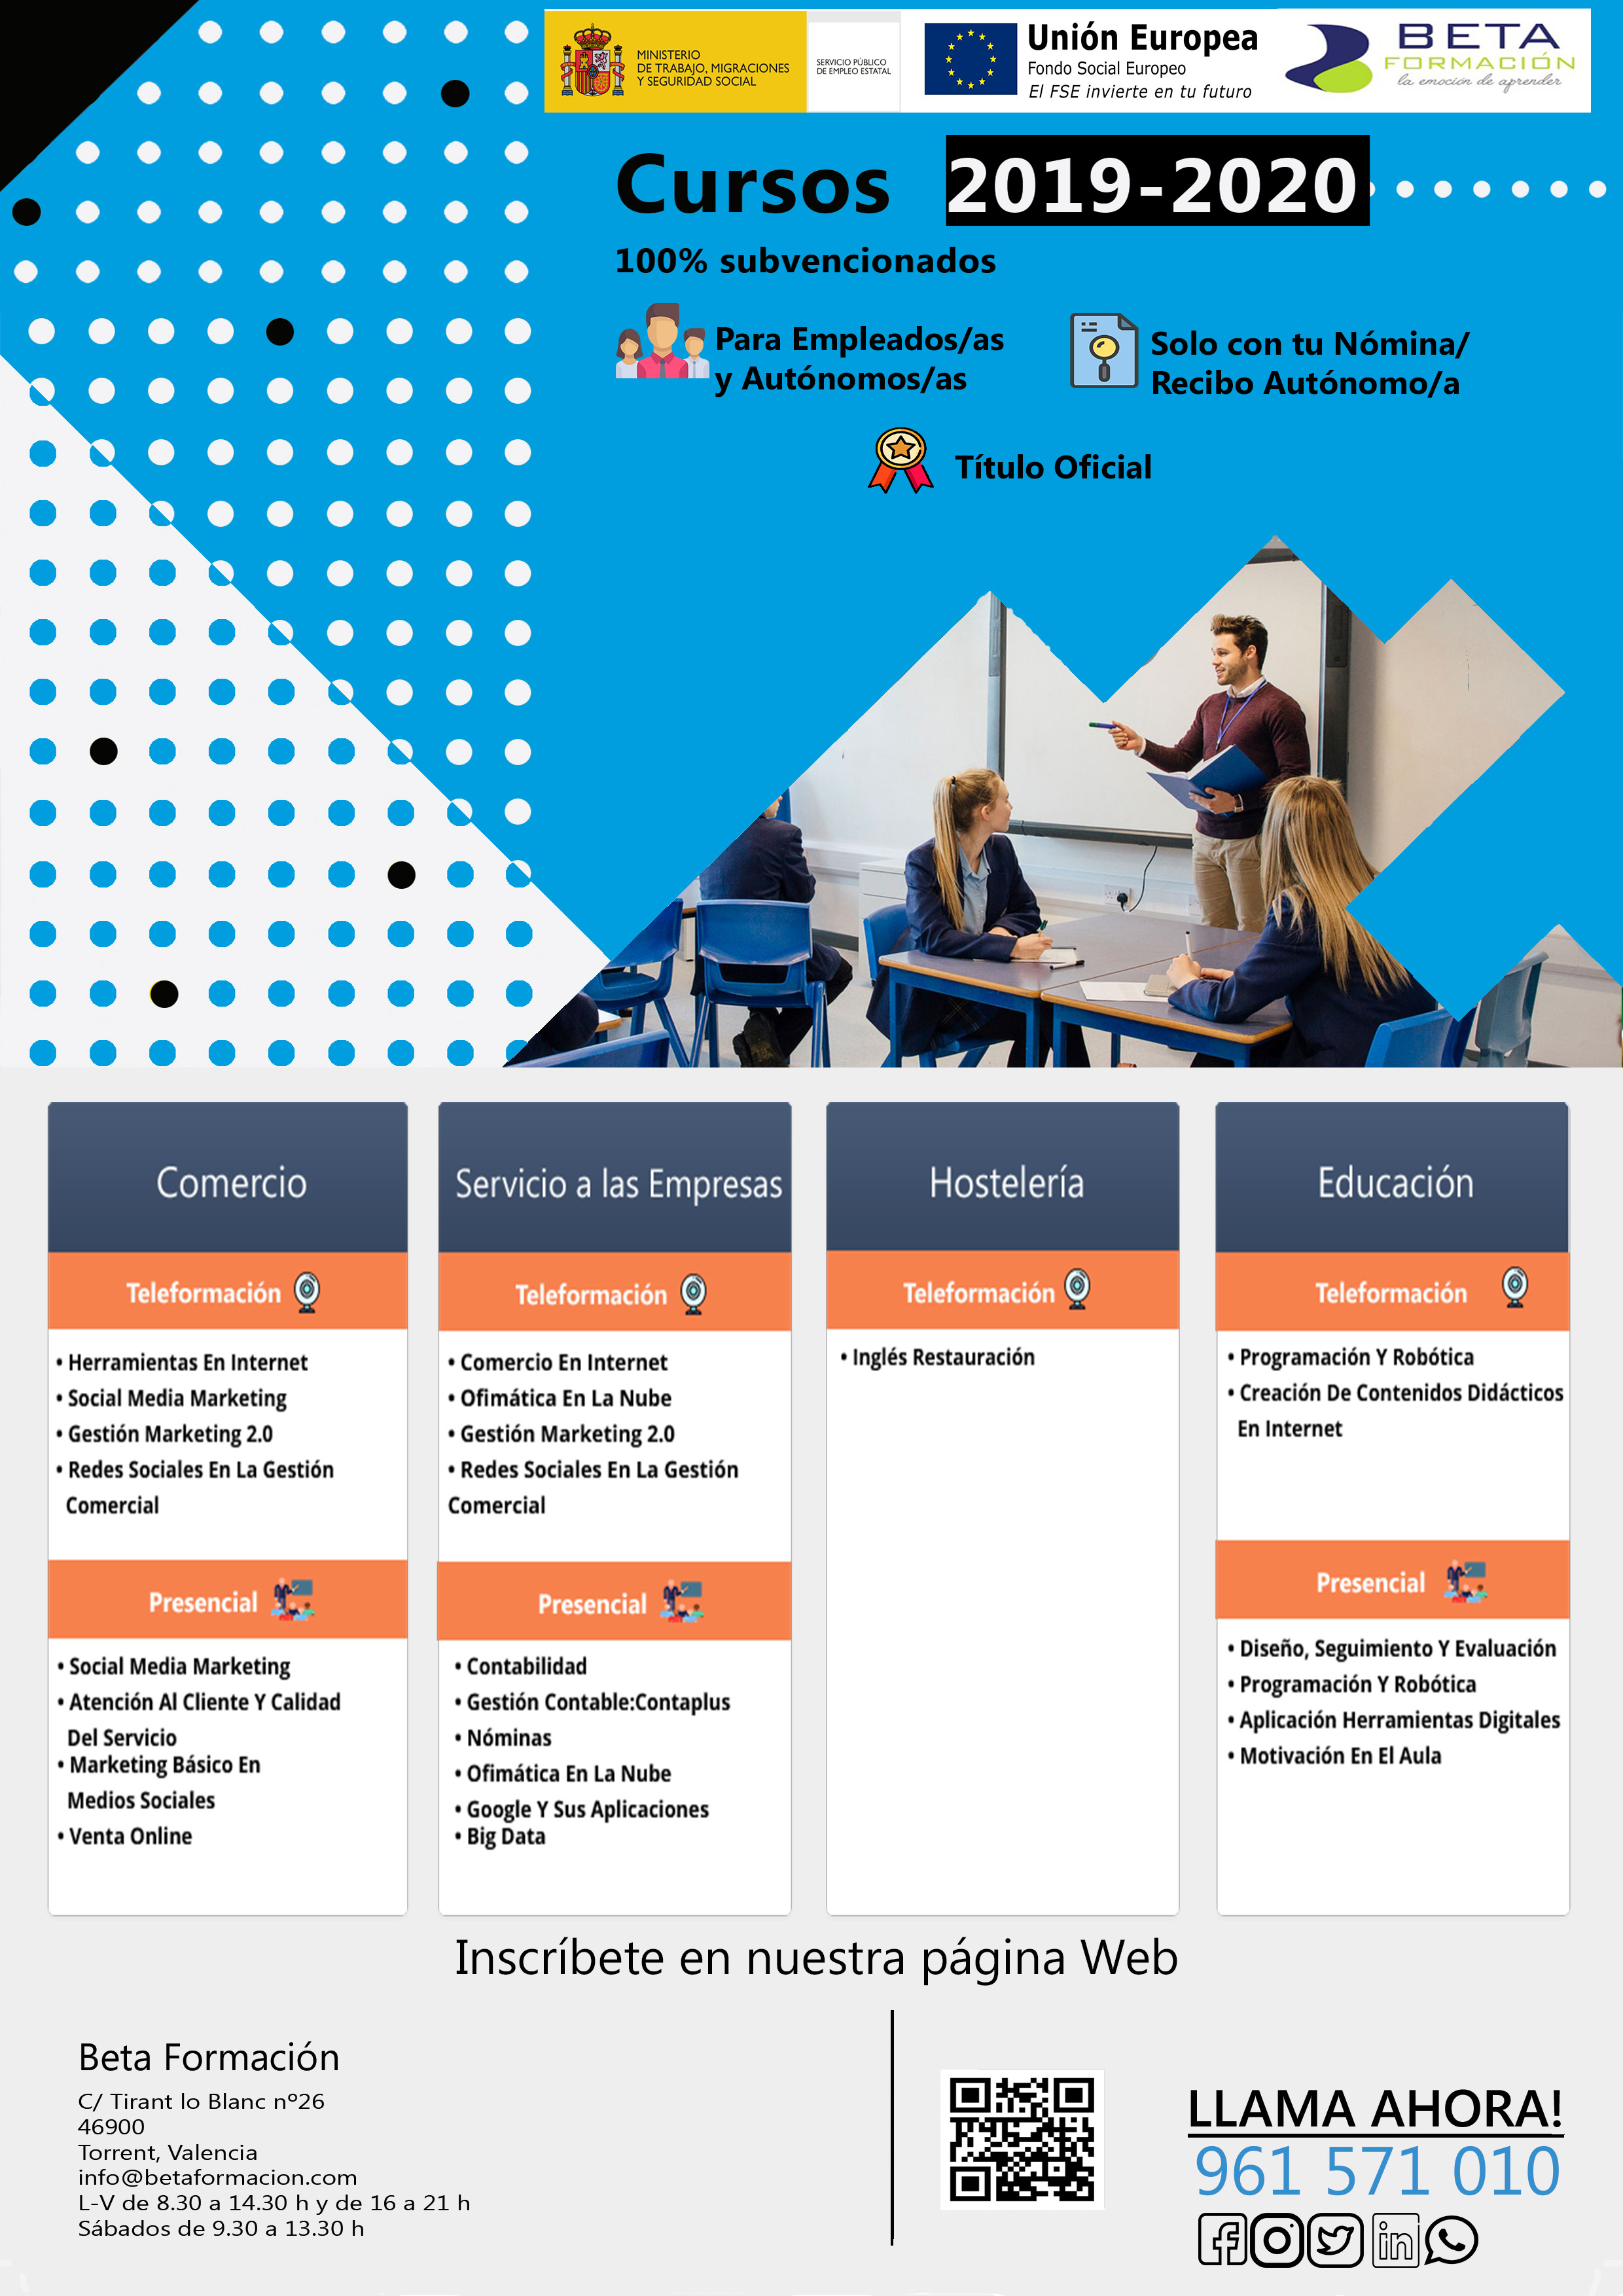 cartelA3 cursos generico - Ofertas